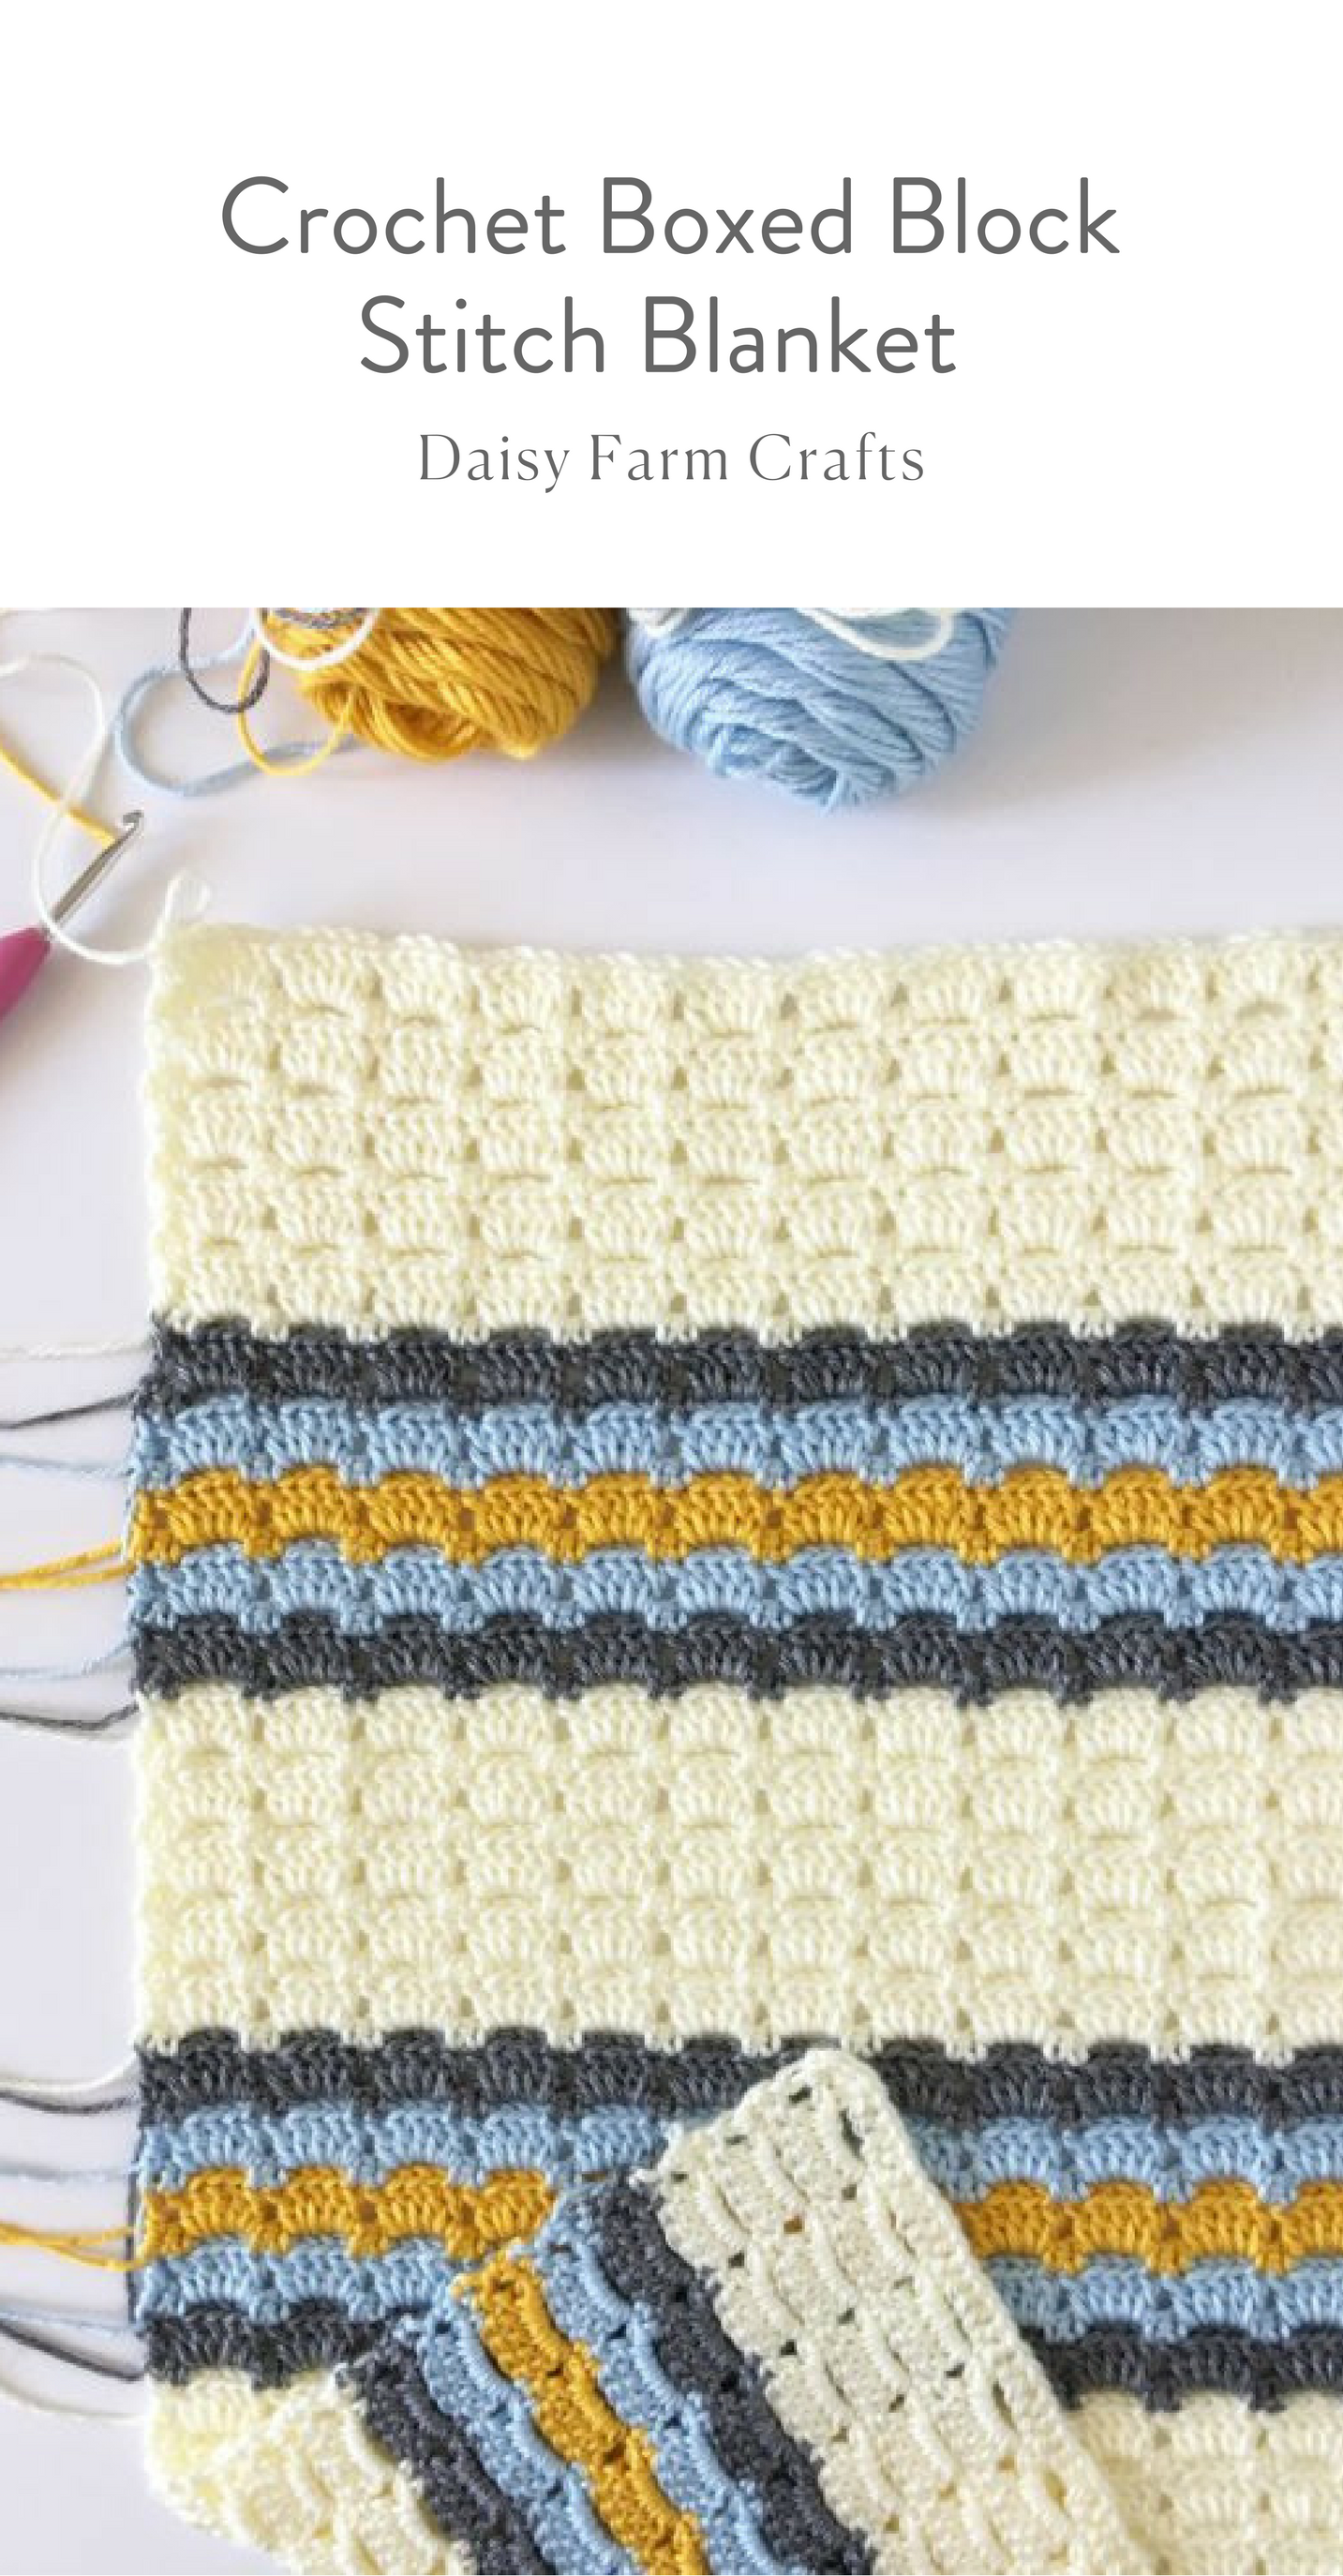 Free Pattern - Crochet Boxed Block Stitch Blanket ...